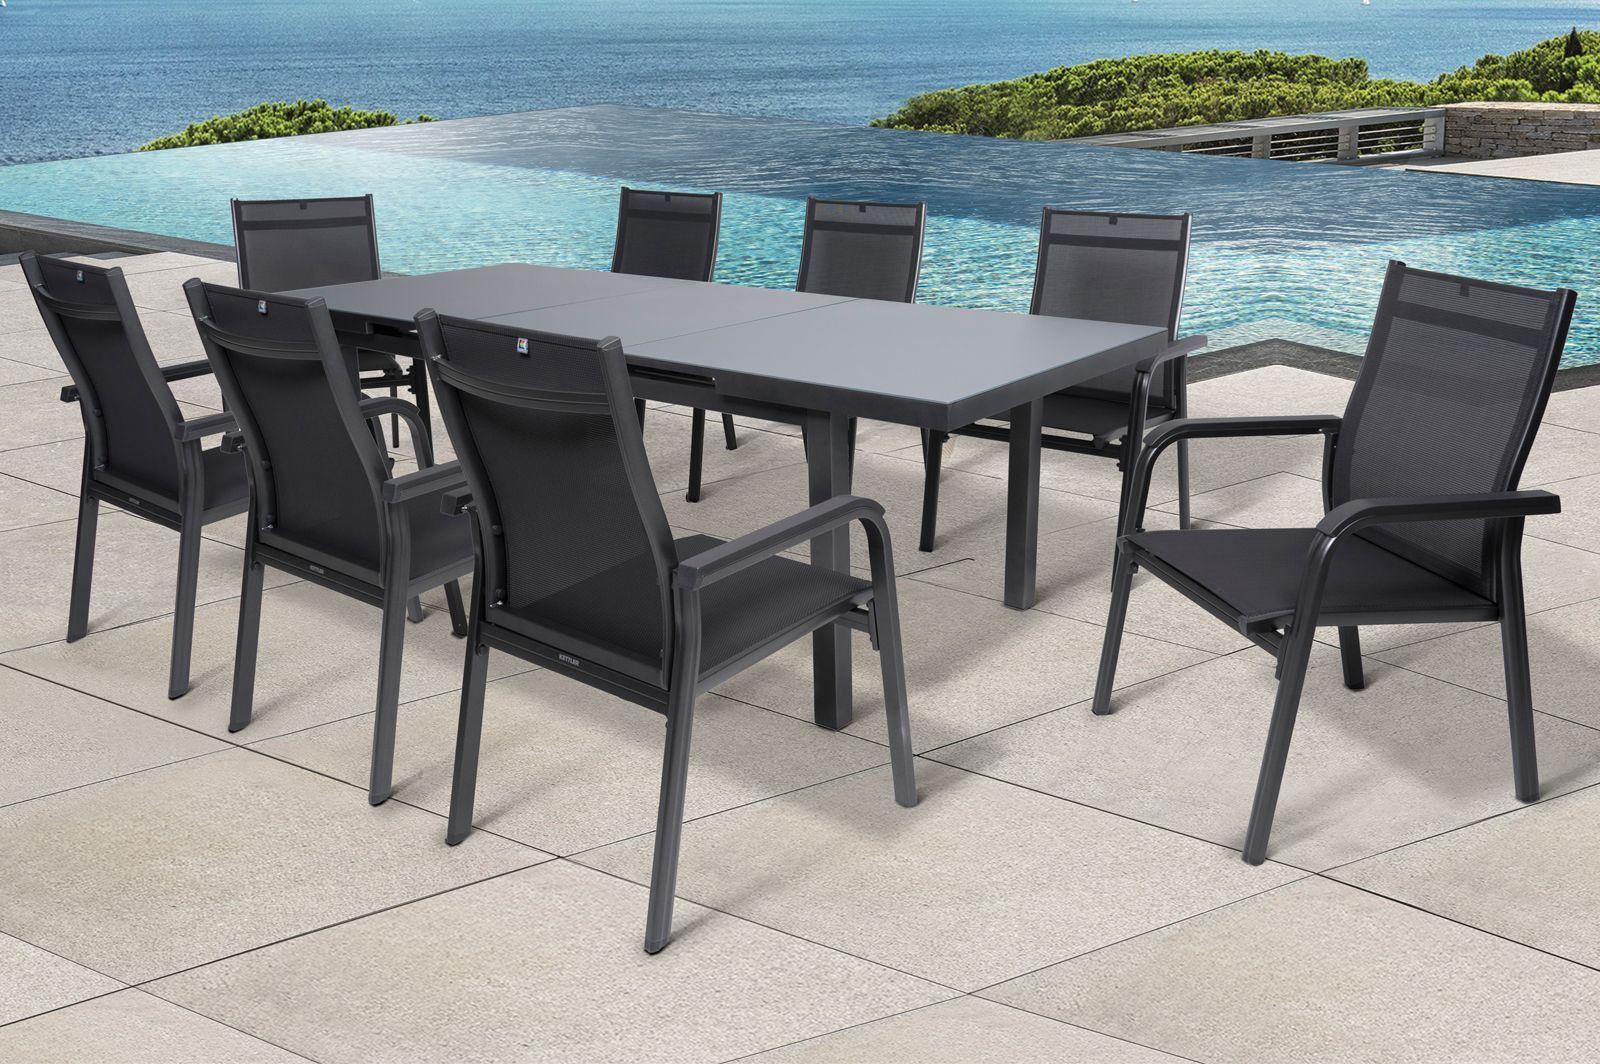 Kettler Basicplus Set Tisch 8 Sessel Anthrazit Gartenmoebel De In 2021 Sitzgruppe Ausziehtisch Gartenmobel